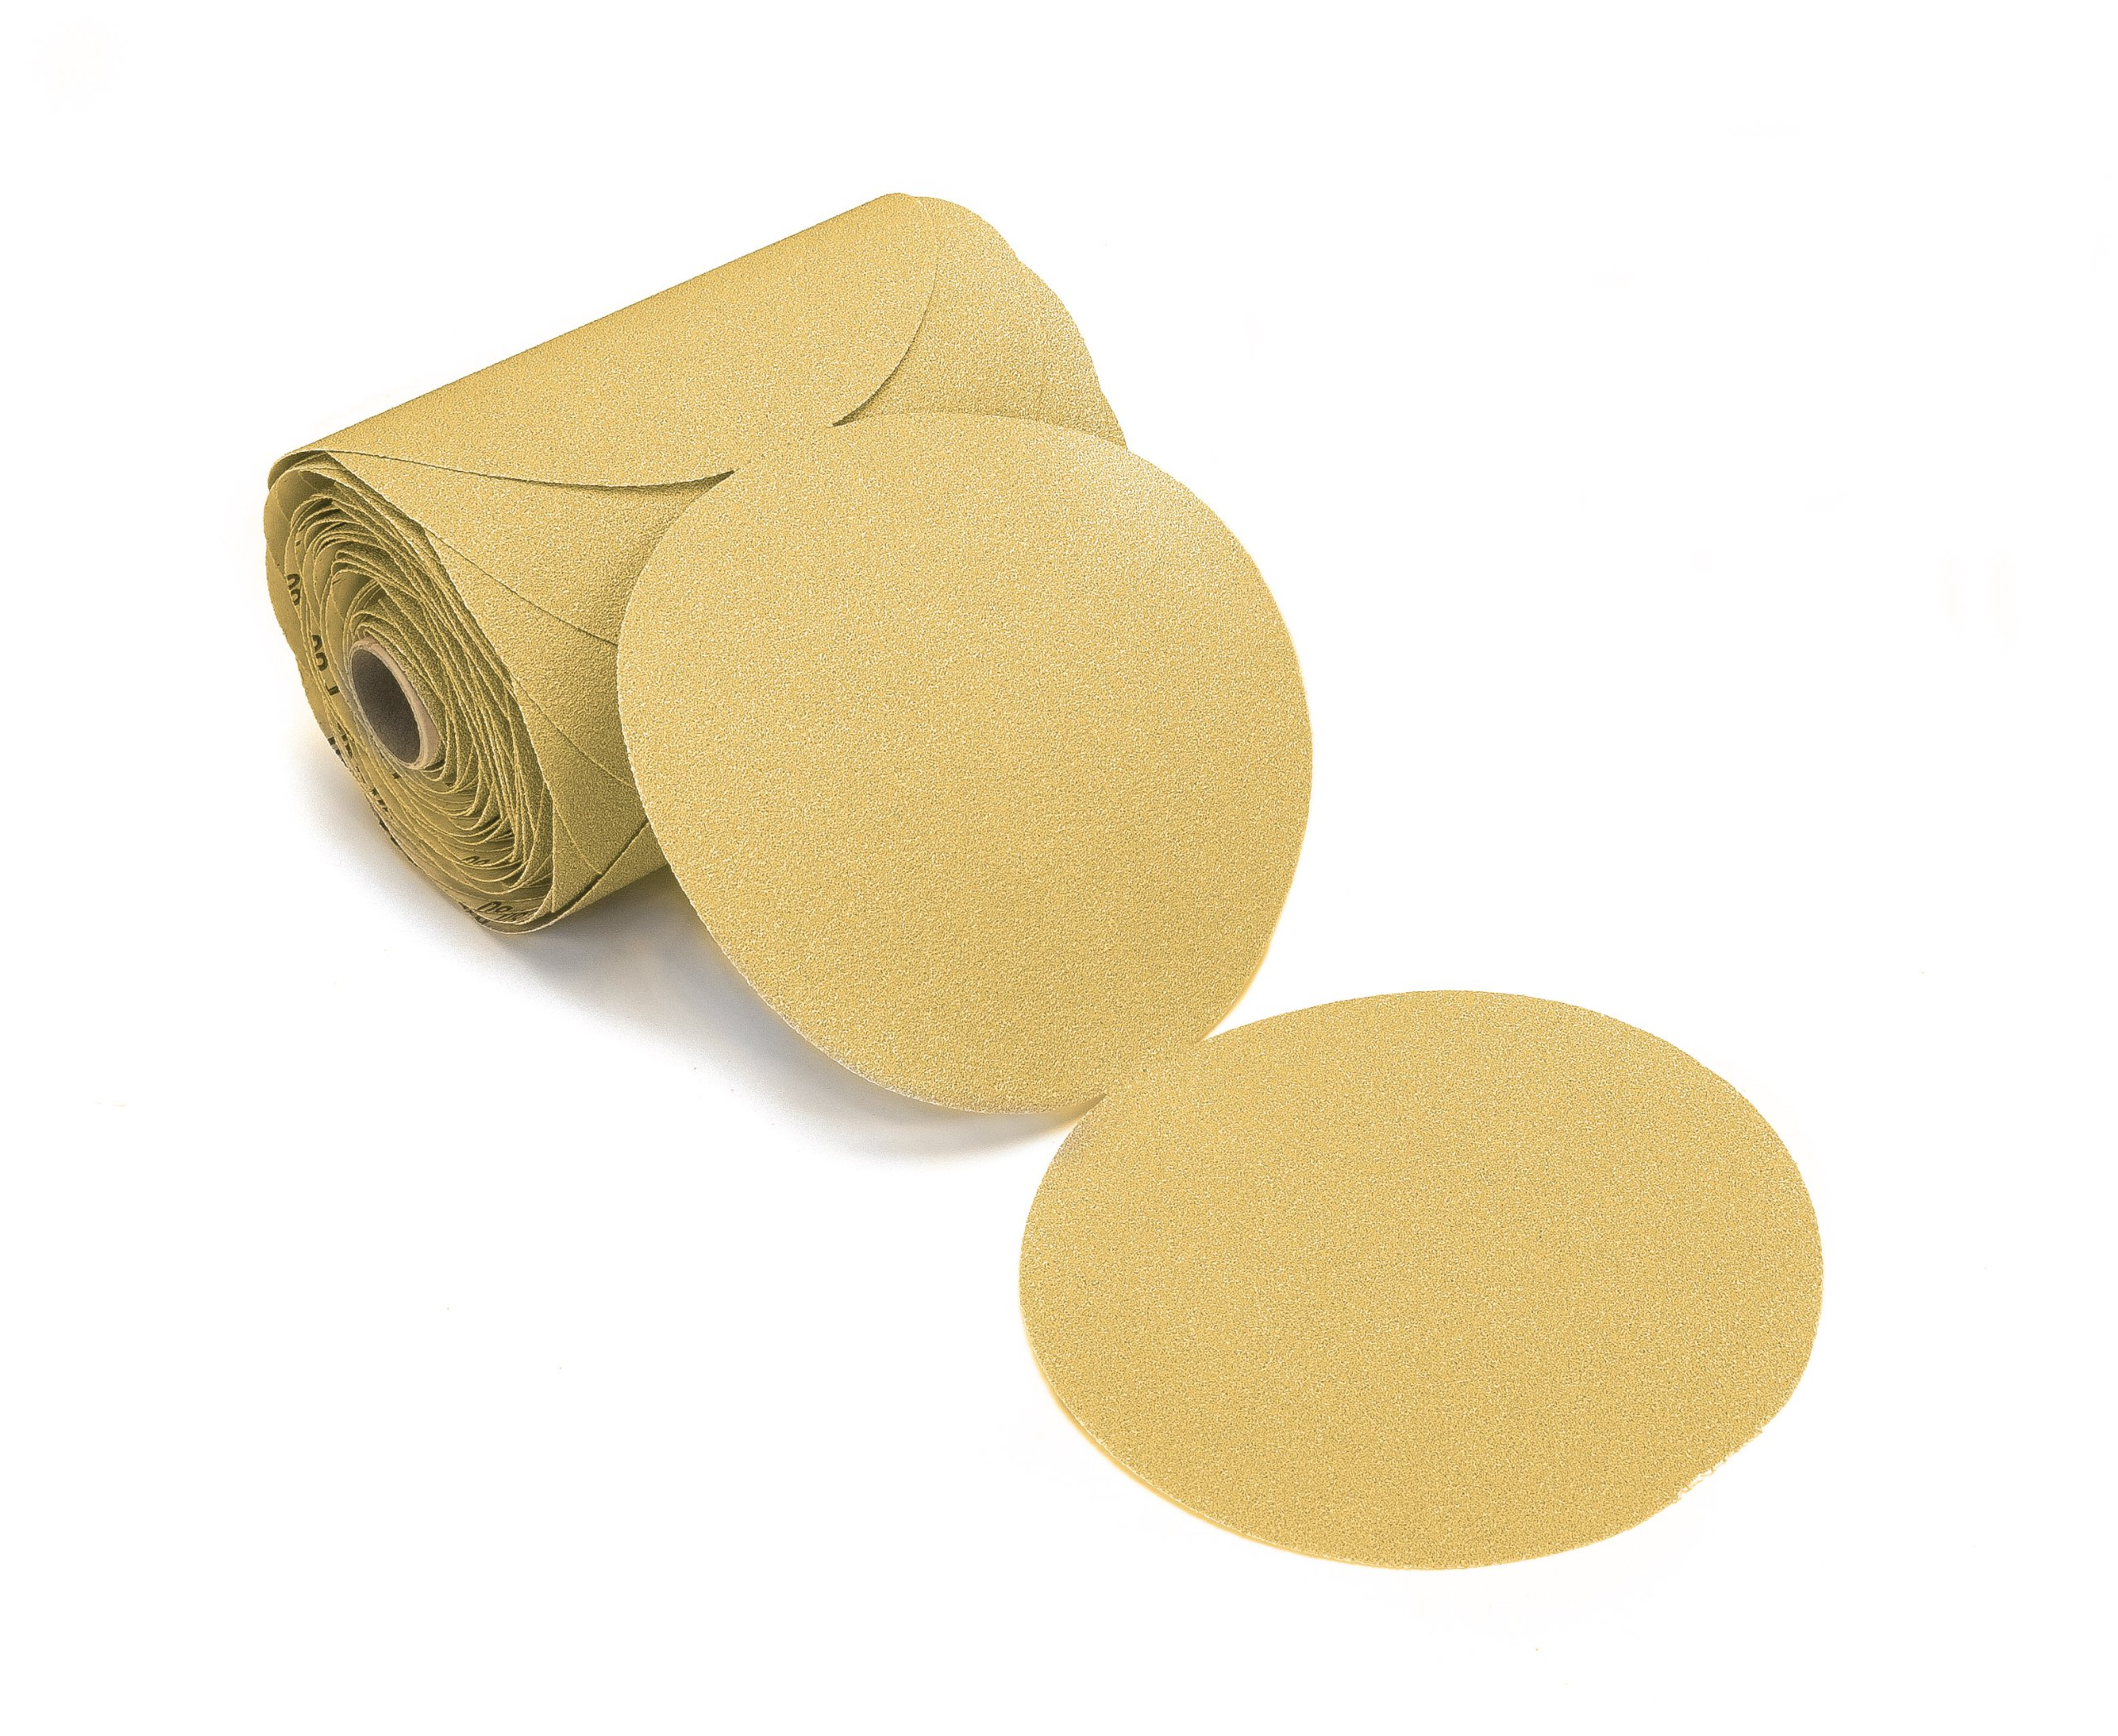 Mirka 23-342-180 Bulldog Gold 6-Inch PSA Linkrol Disc with 180 Grit